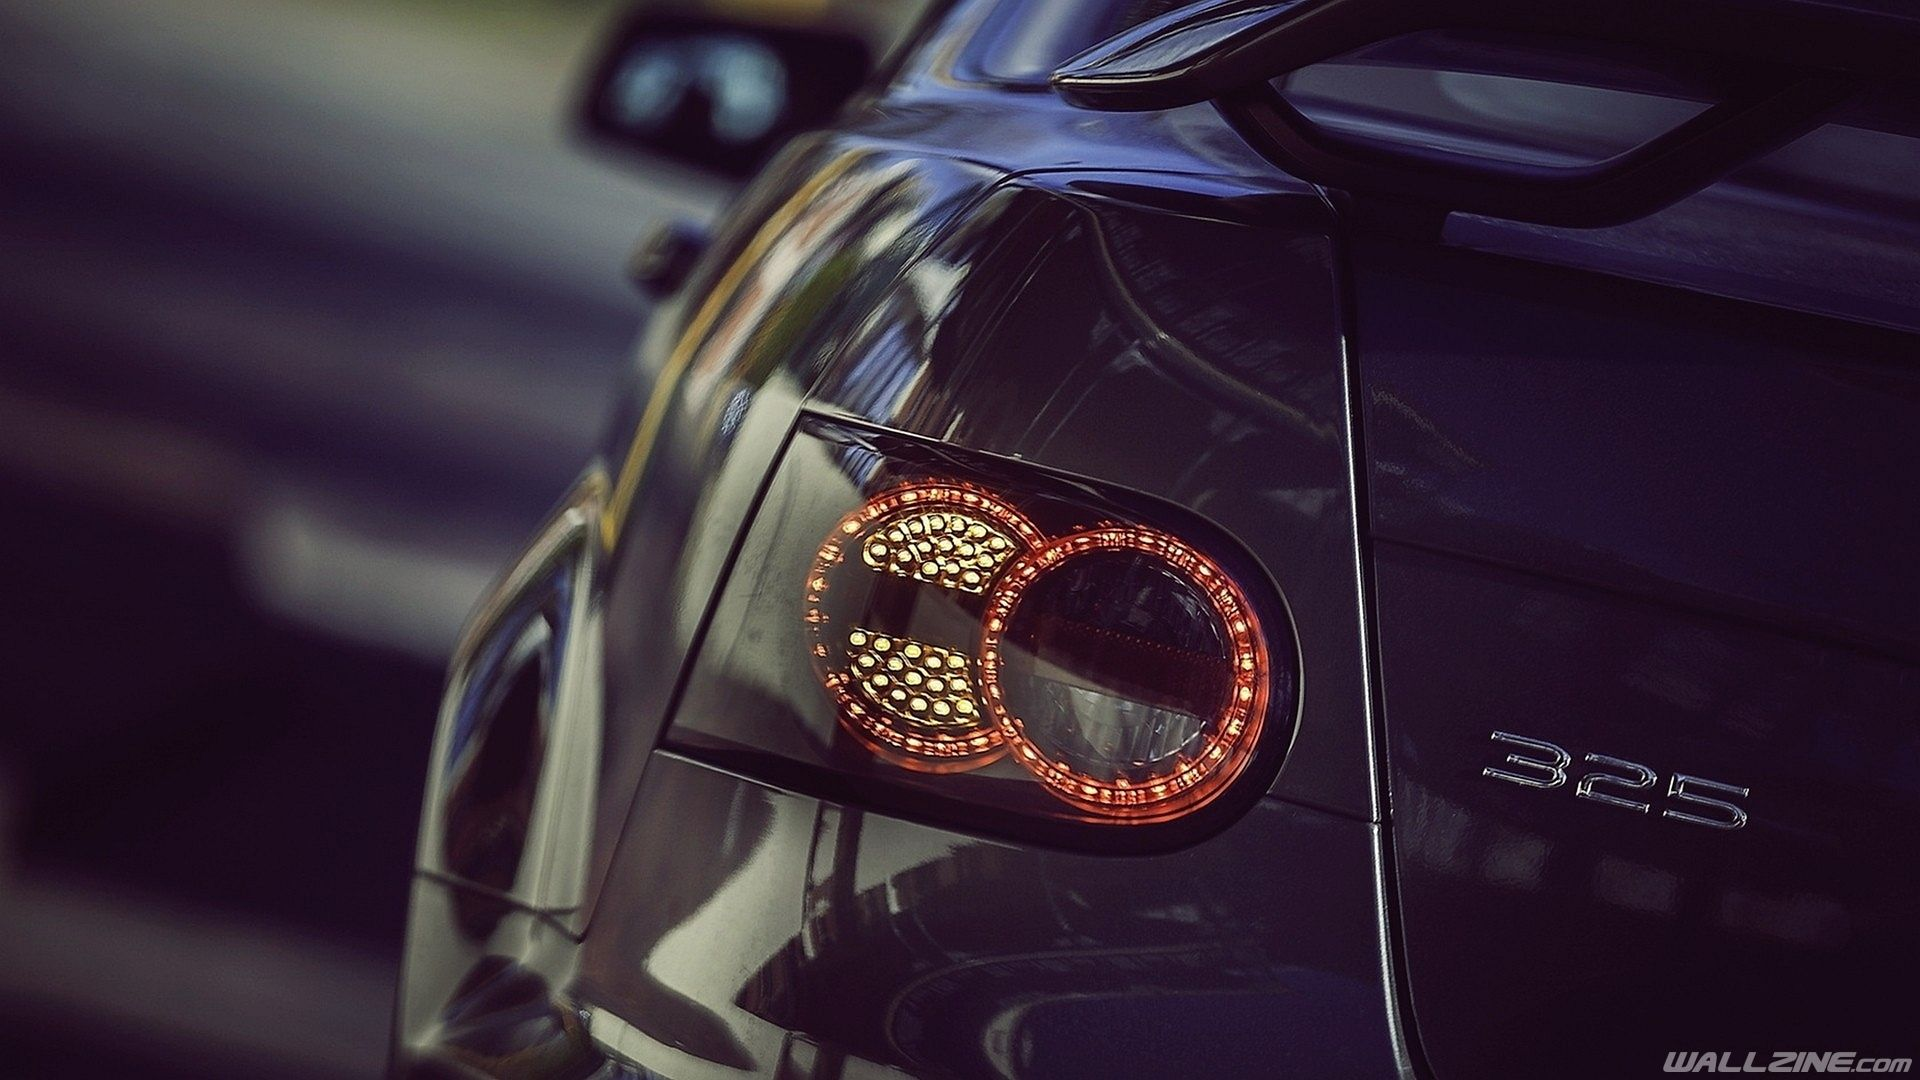 Tail Lights Wallpaper Holden monaro, Car wallpapers, Holden